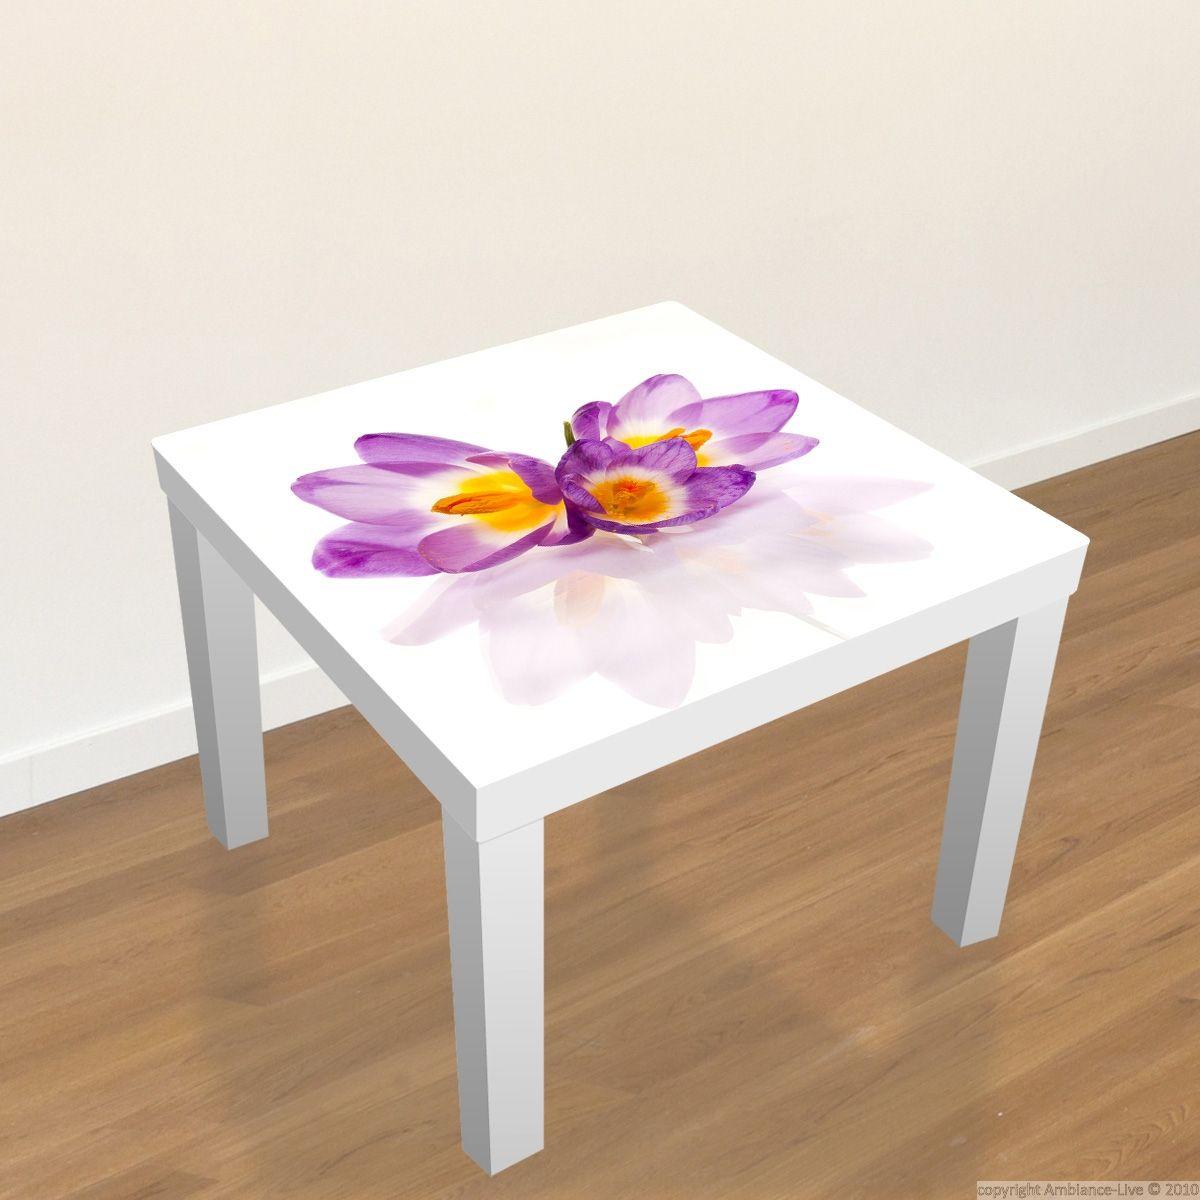 Captivating #Ikea #Table #Decal   Crocuses // #Stickers Table Ikea   Crocus